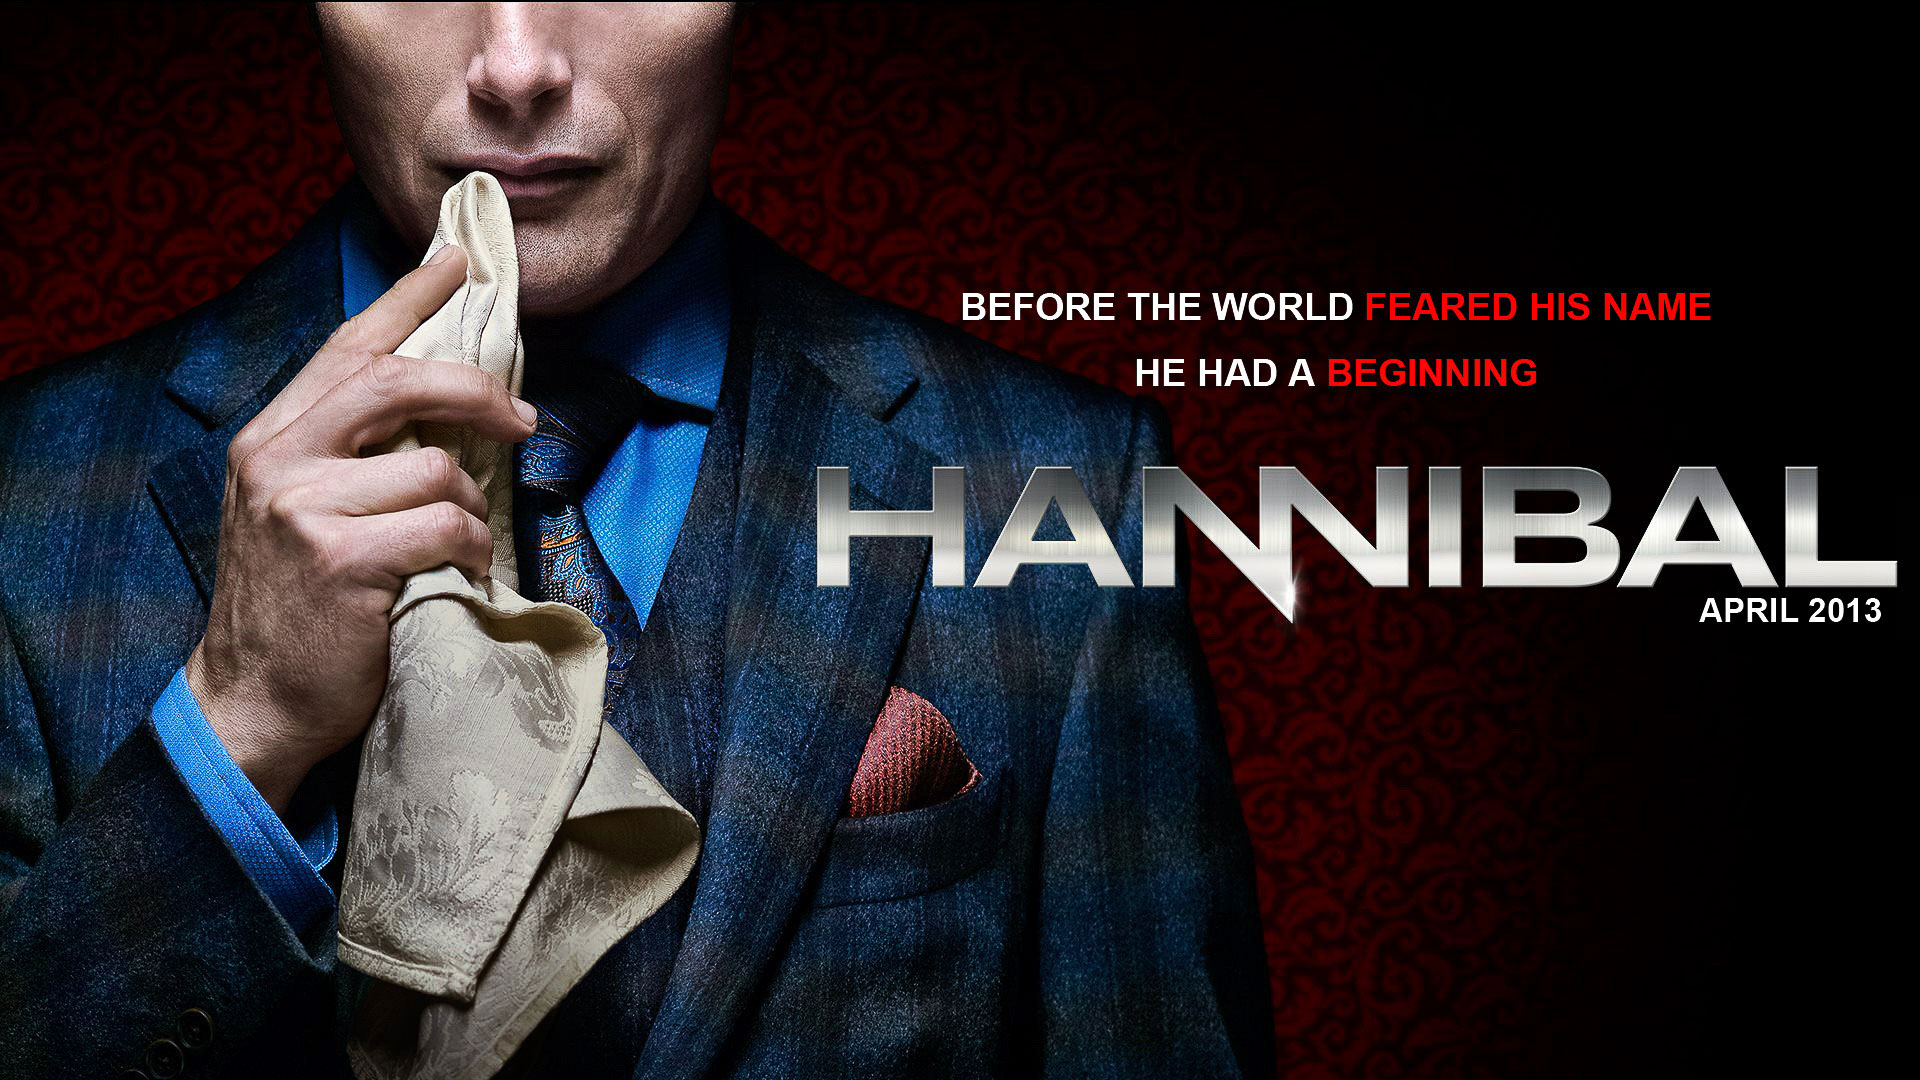 Hannibal (VoicesFILM) [1920 x 1080] (2)